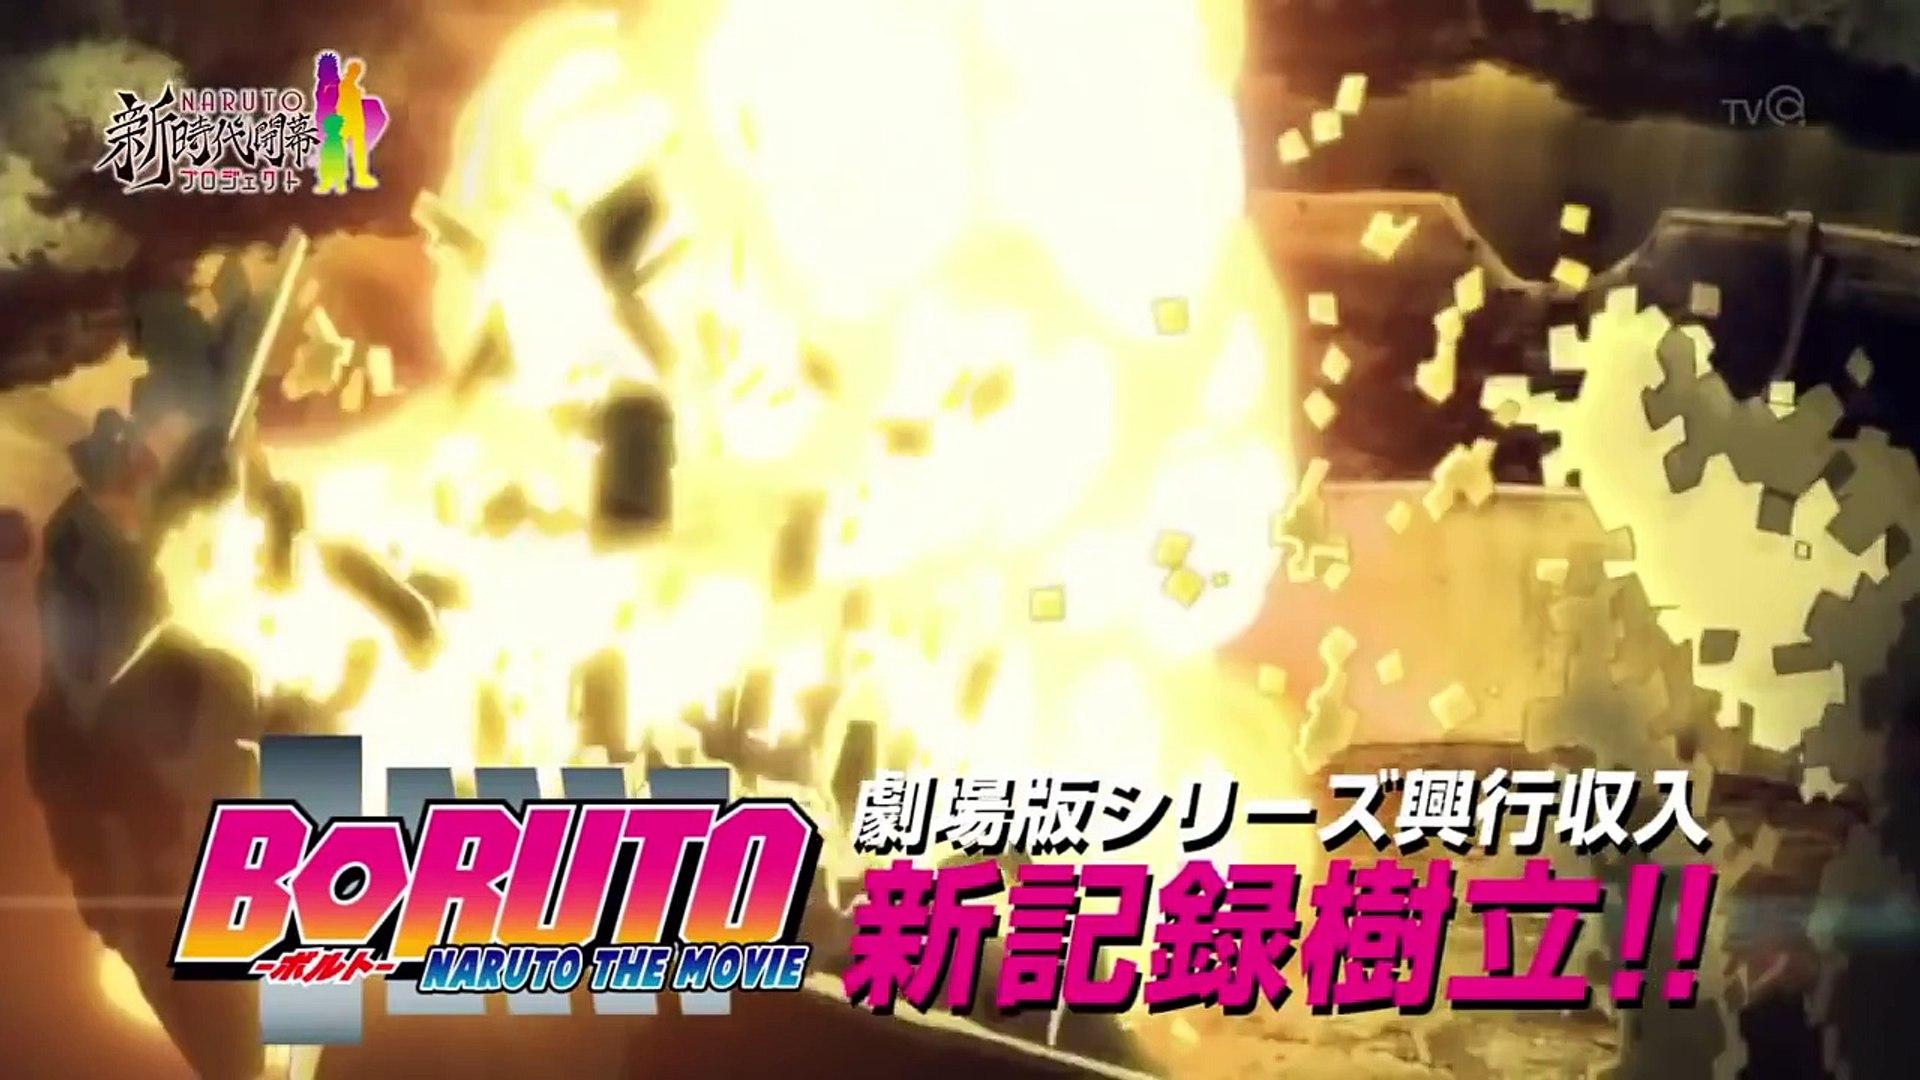 【Boruto: Naruto The Movie】● SPECIAL PV !!!